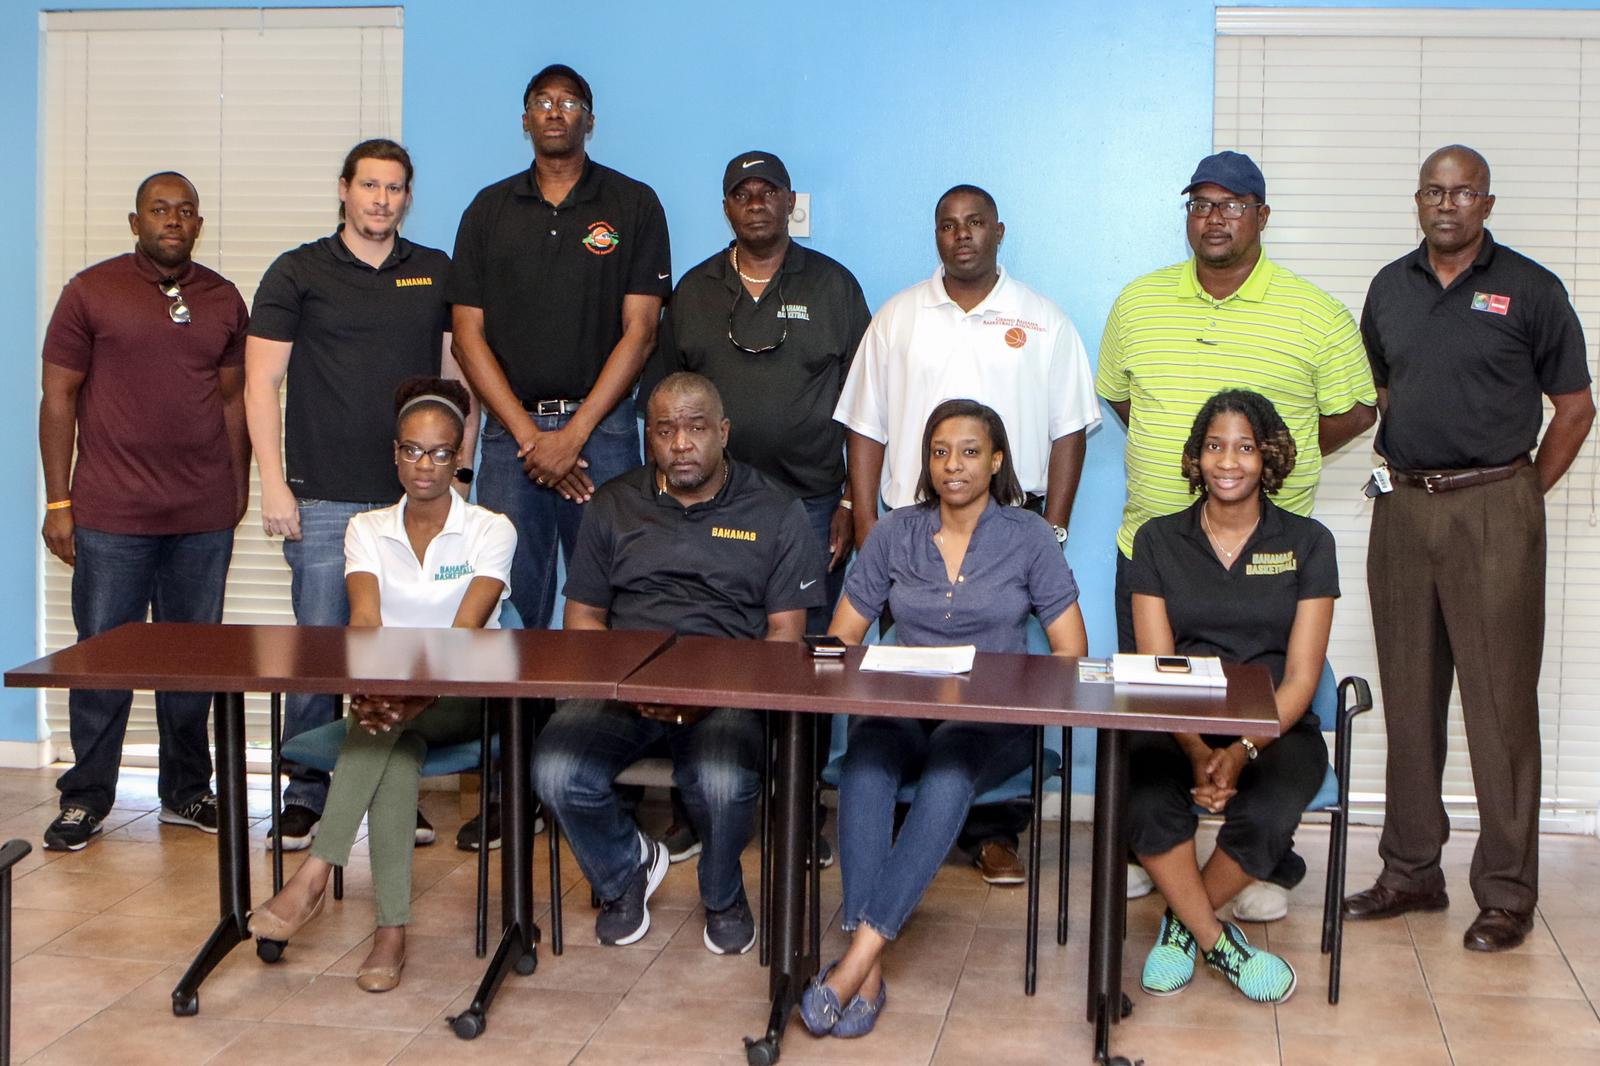 Bowleg elected to head Bahamas Basketball Federation